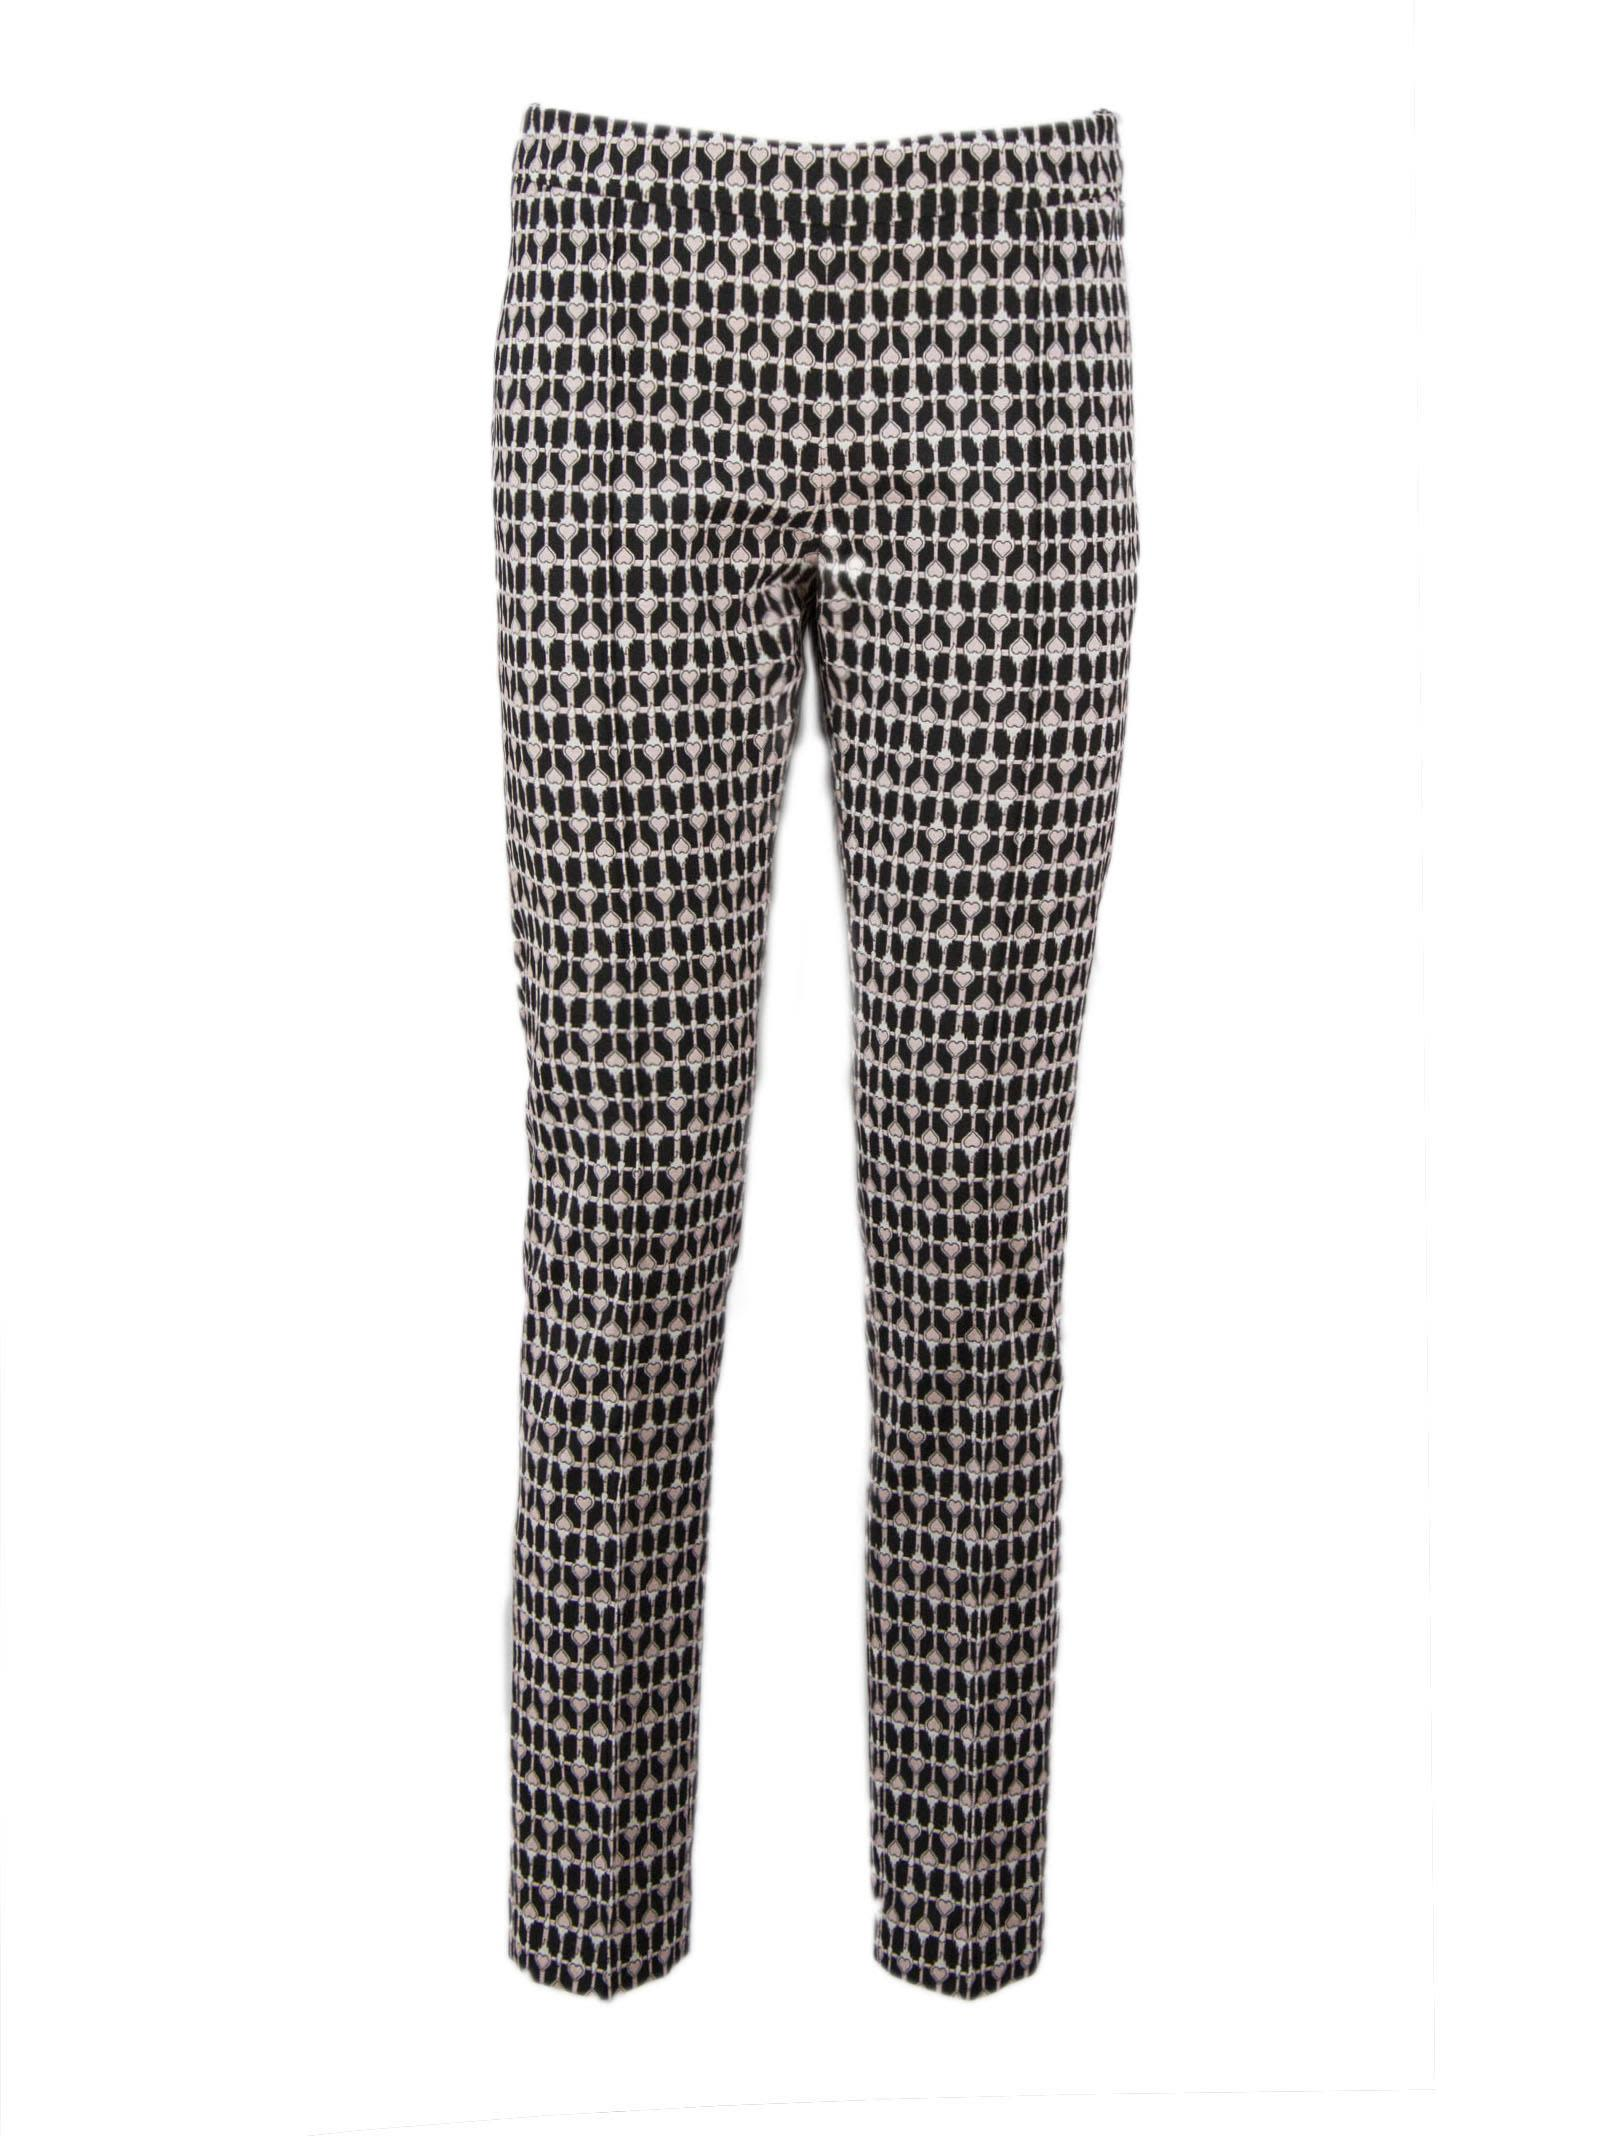 Jeans On Sale, Black, Cotton, 2017, 30 Dondup